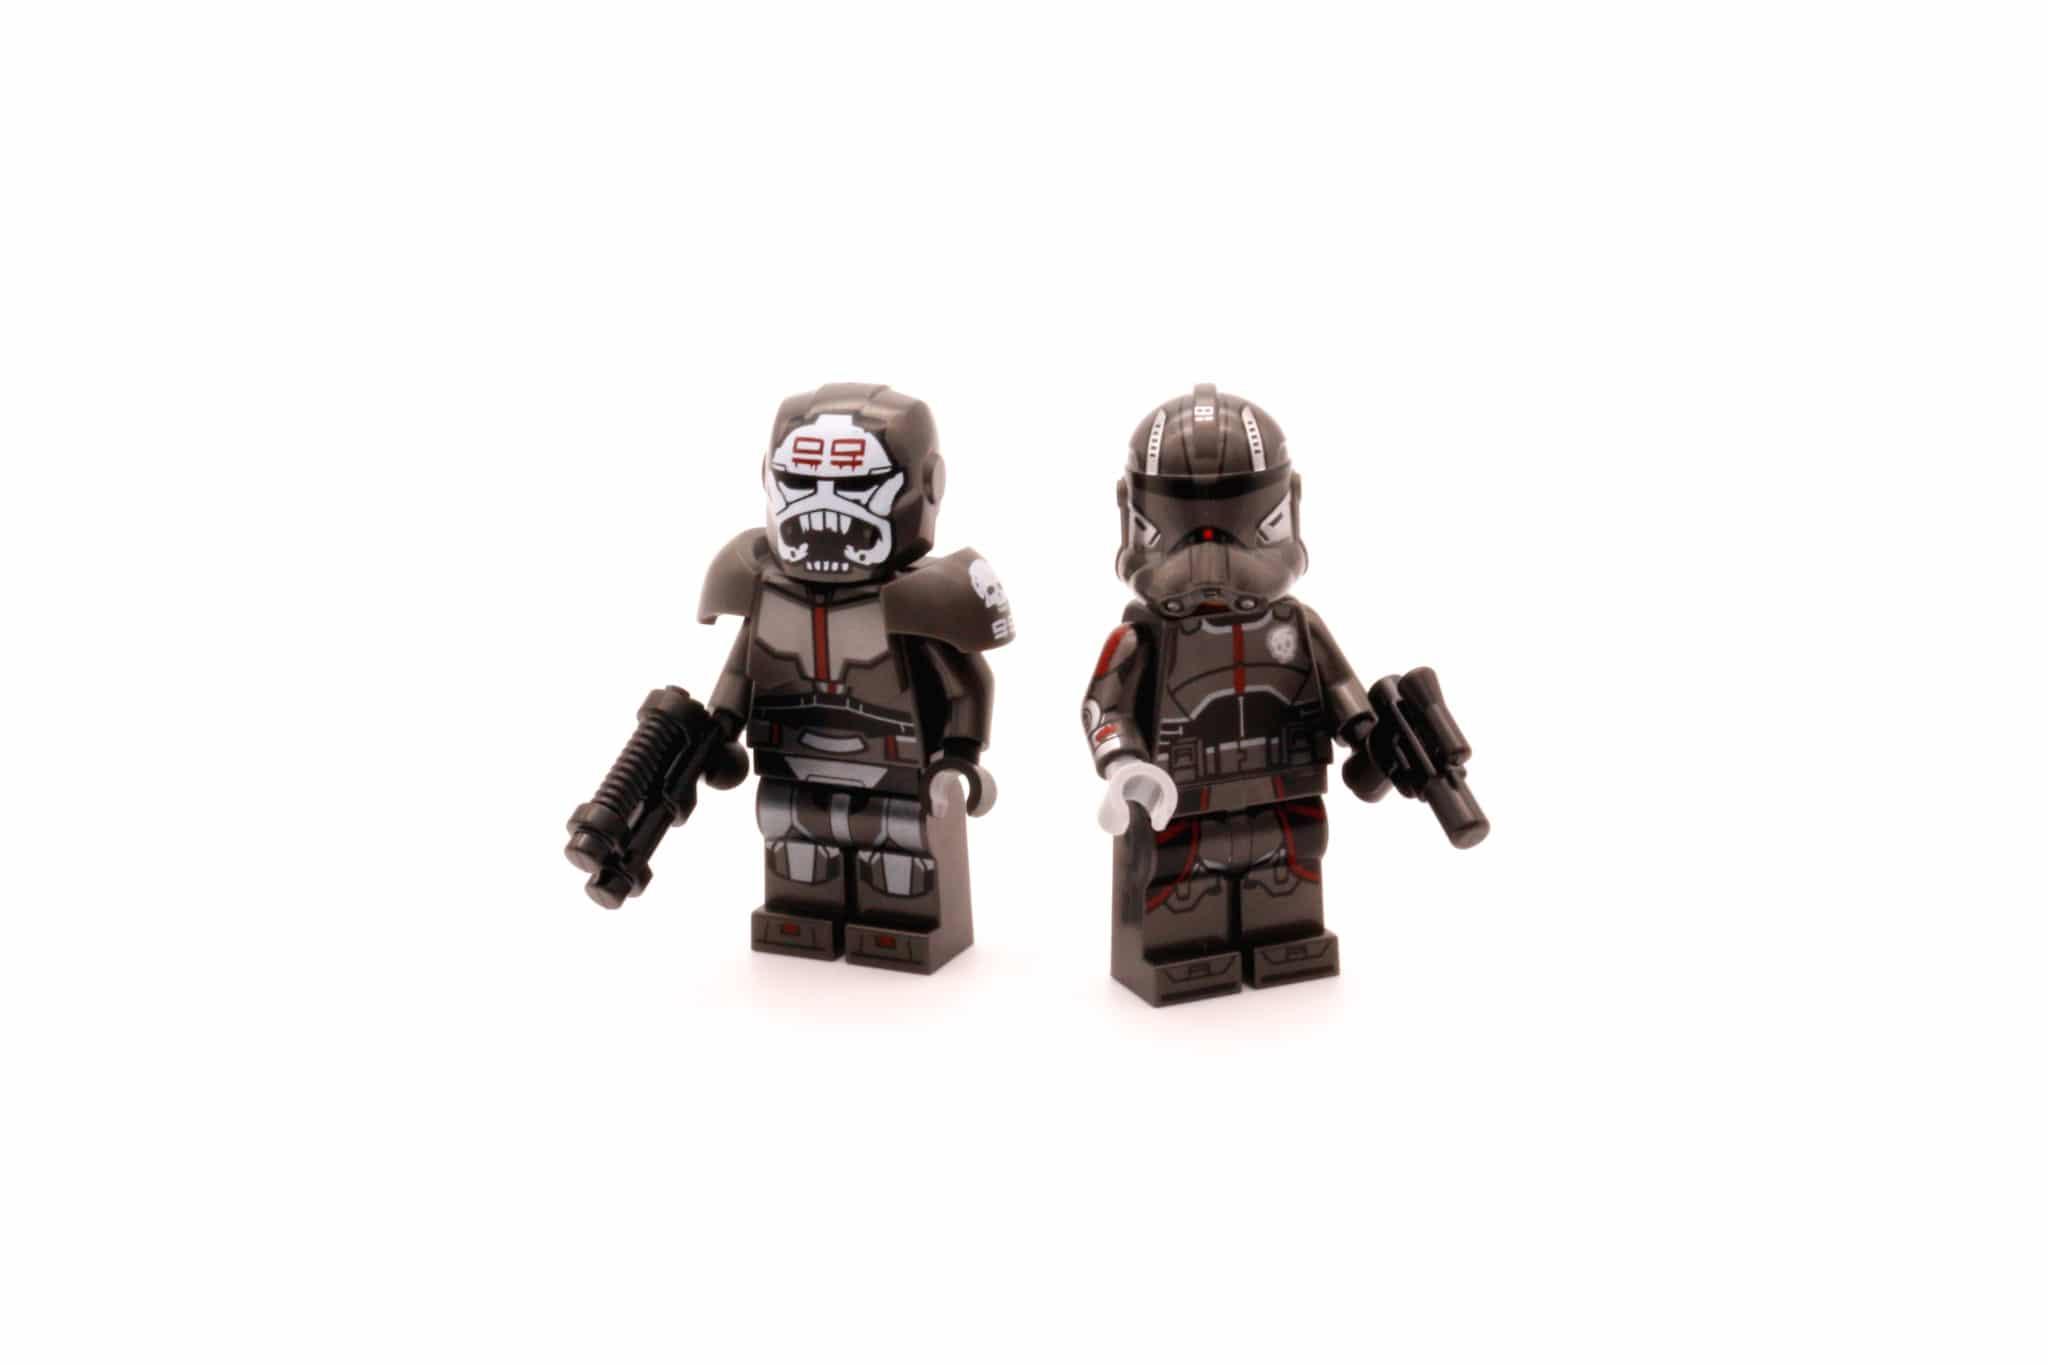 LEGO Star Wars 75314 The Bad Batch Attack Shuttle Bag 5 Minifiguren